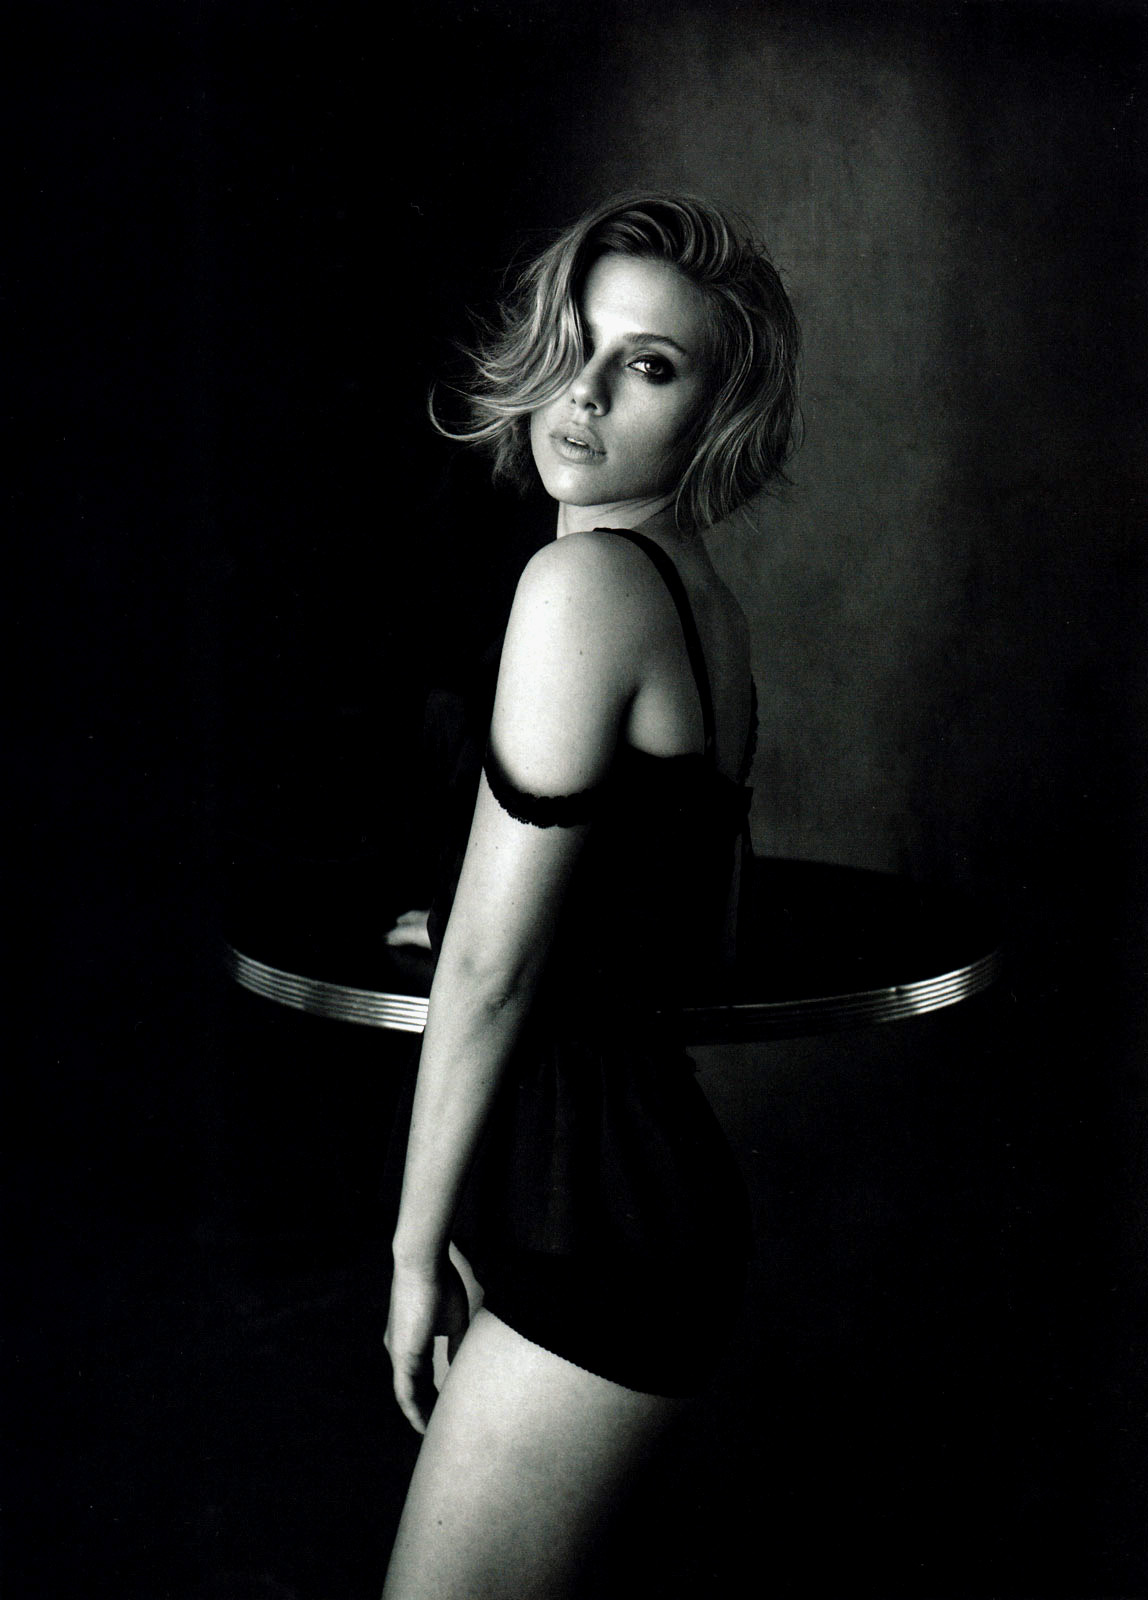 http://1.bp.blogspot.com/-6OrUX56oHuw/To2YyX38ARI/AAAAAAAAcMM/qCEi0HcCYJY/s1600/Scarlett_Johansson_VOGUE_111010004.jpg